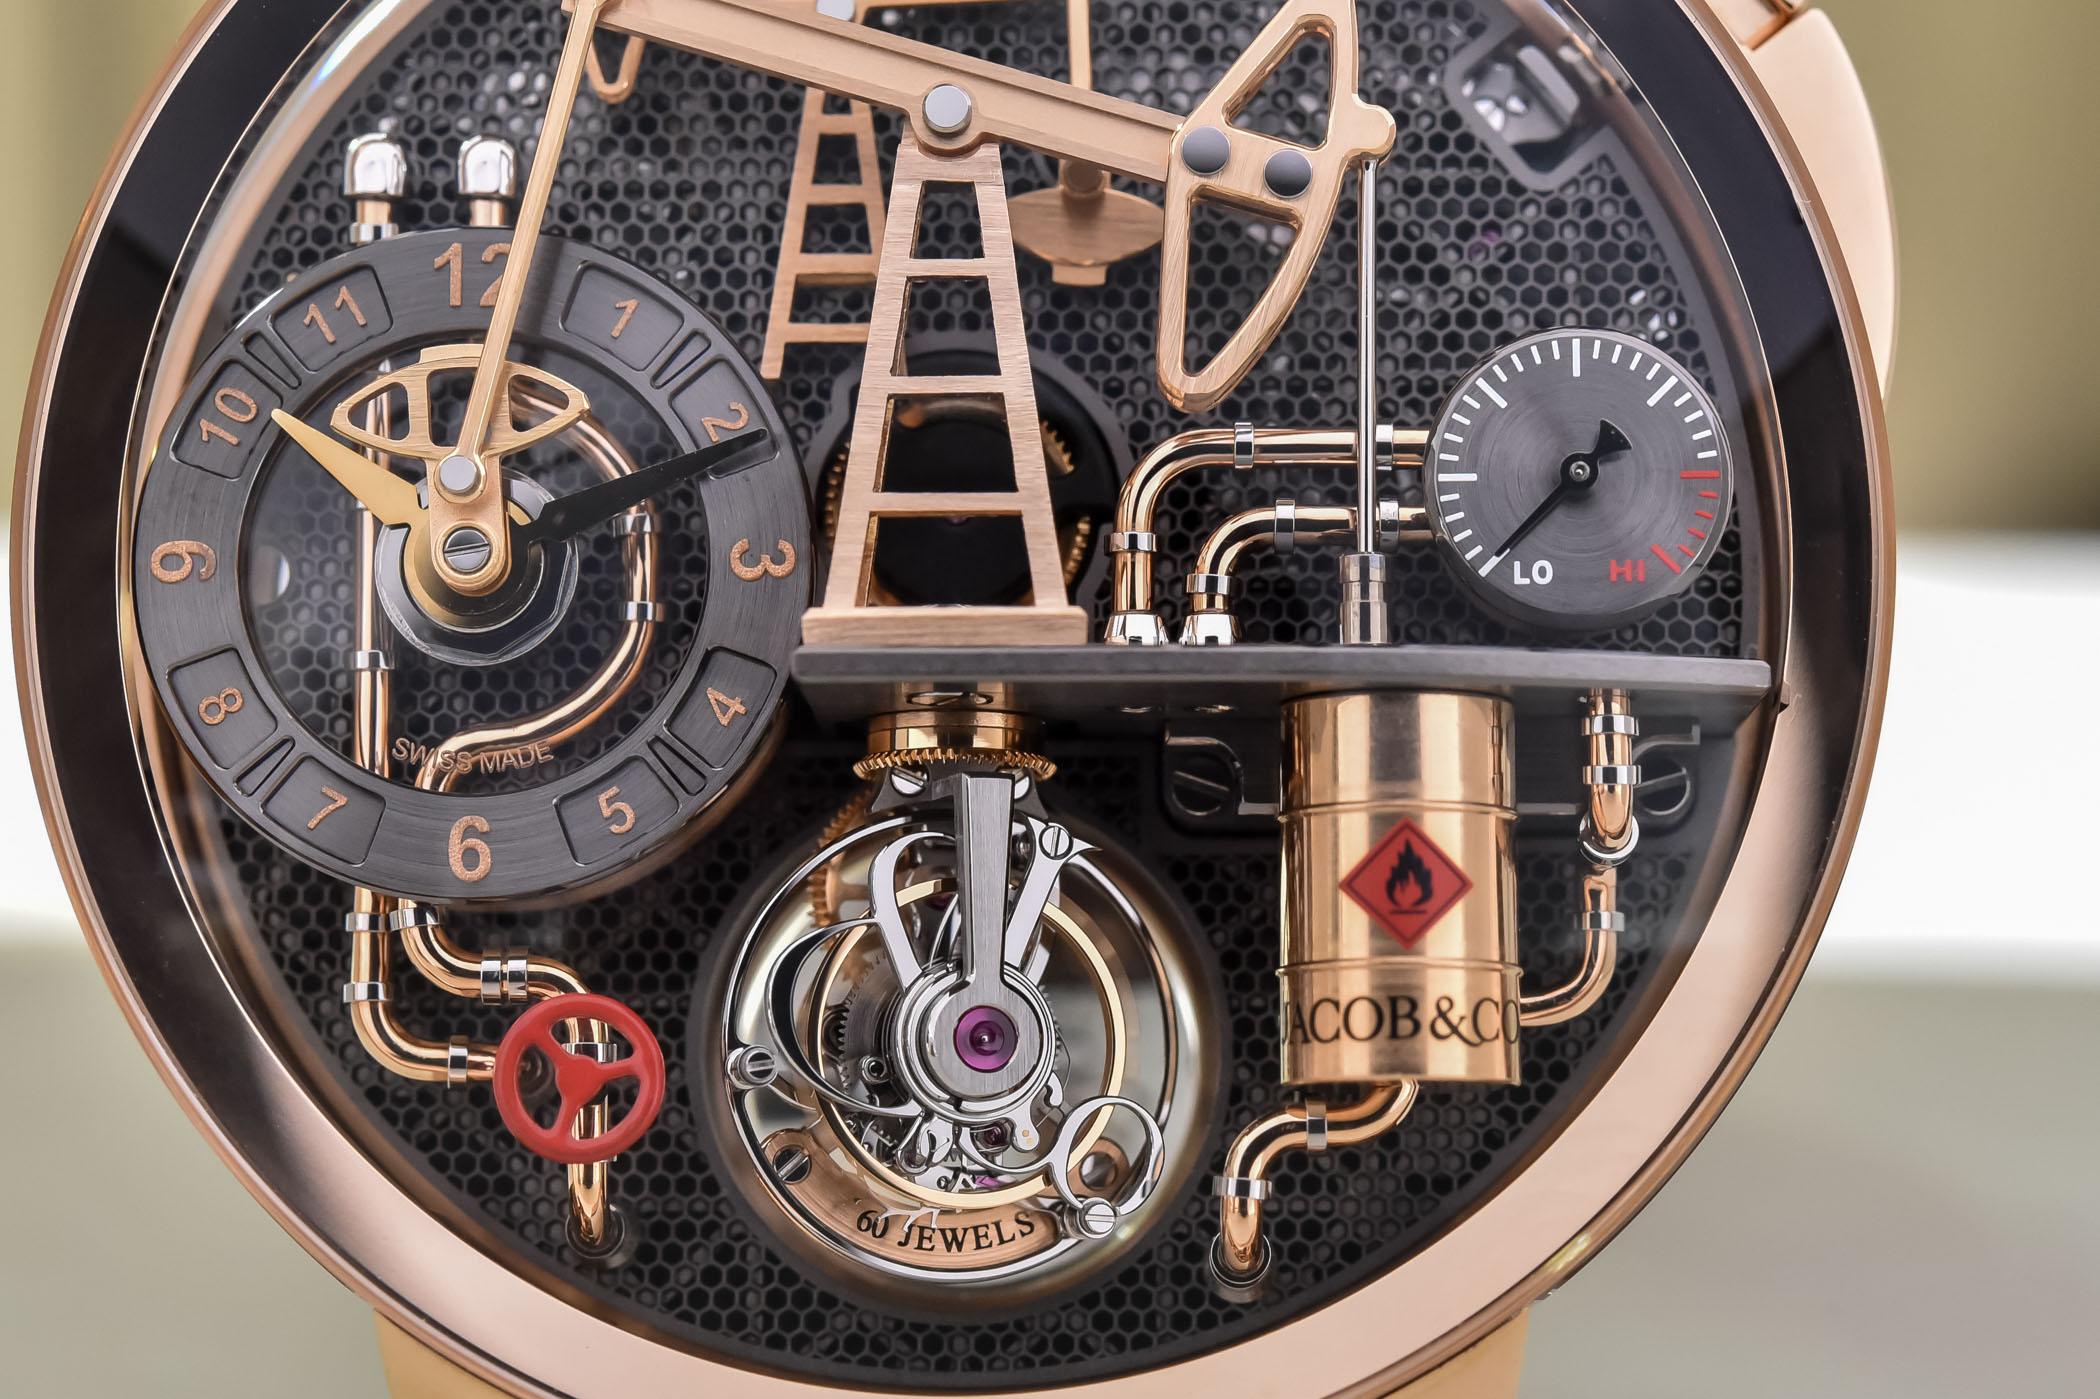 Jacob and Co Oil Pump Tourbillon Automaton Rose Gold - Review - 4